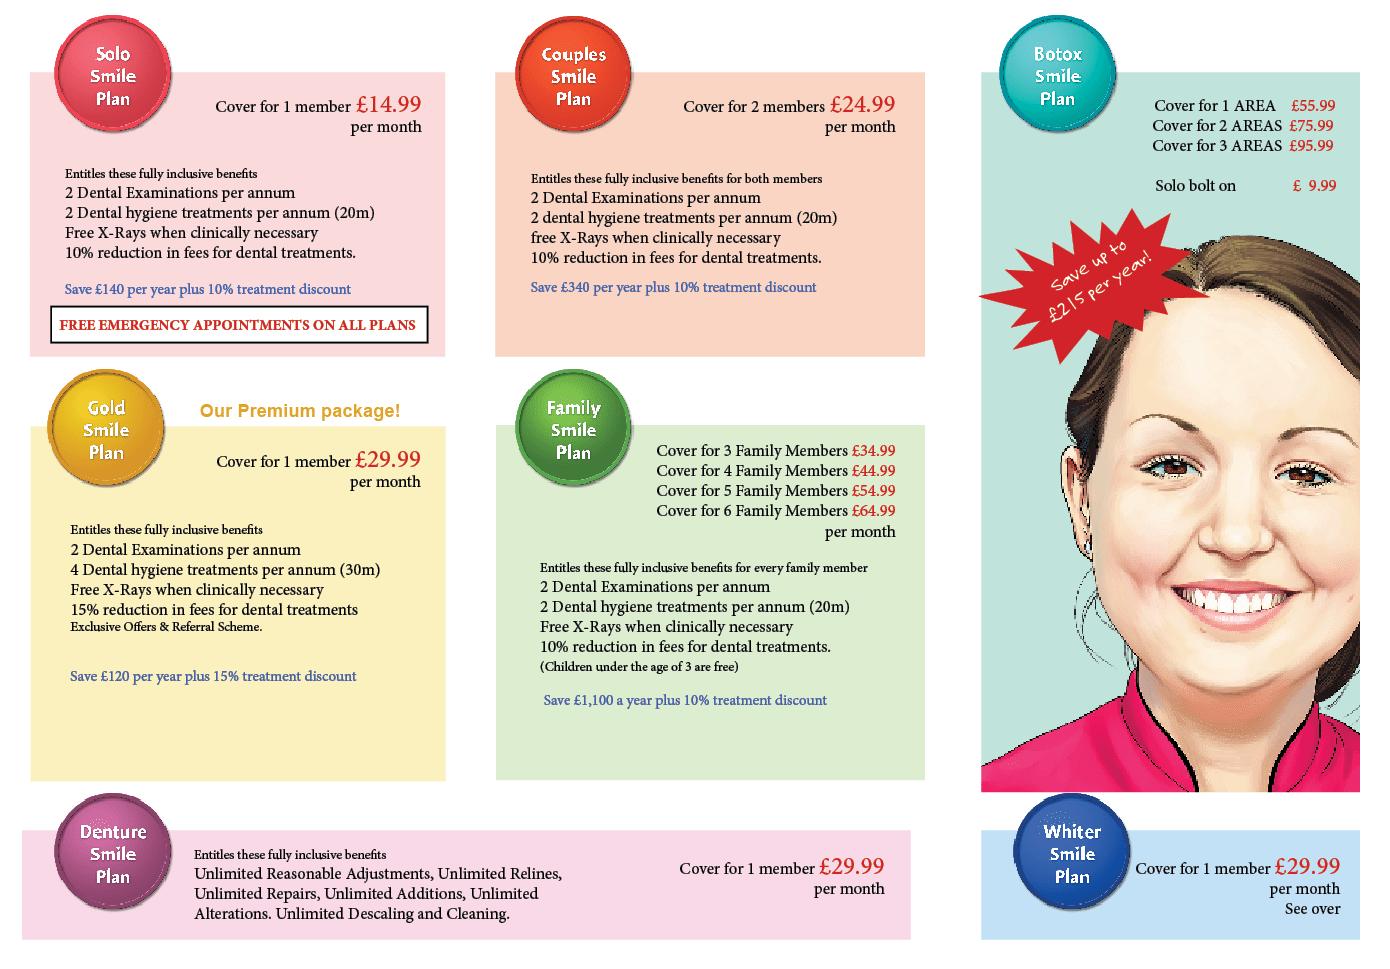 pricelist 2018 smile plans